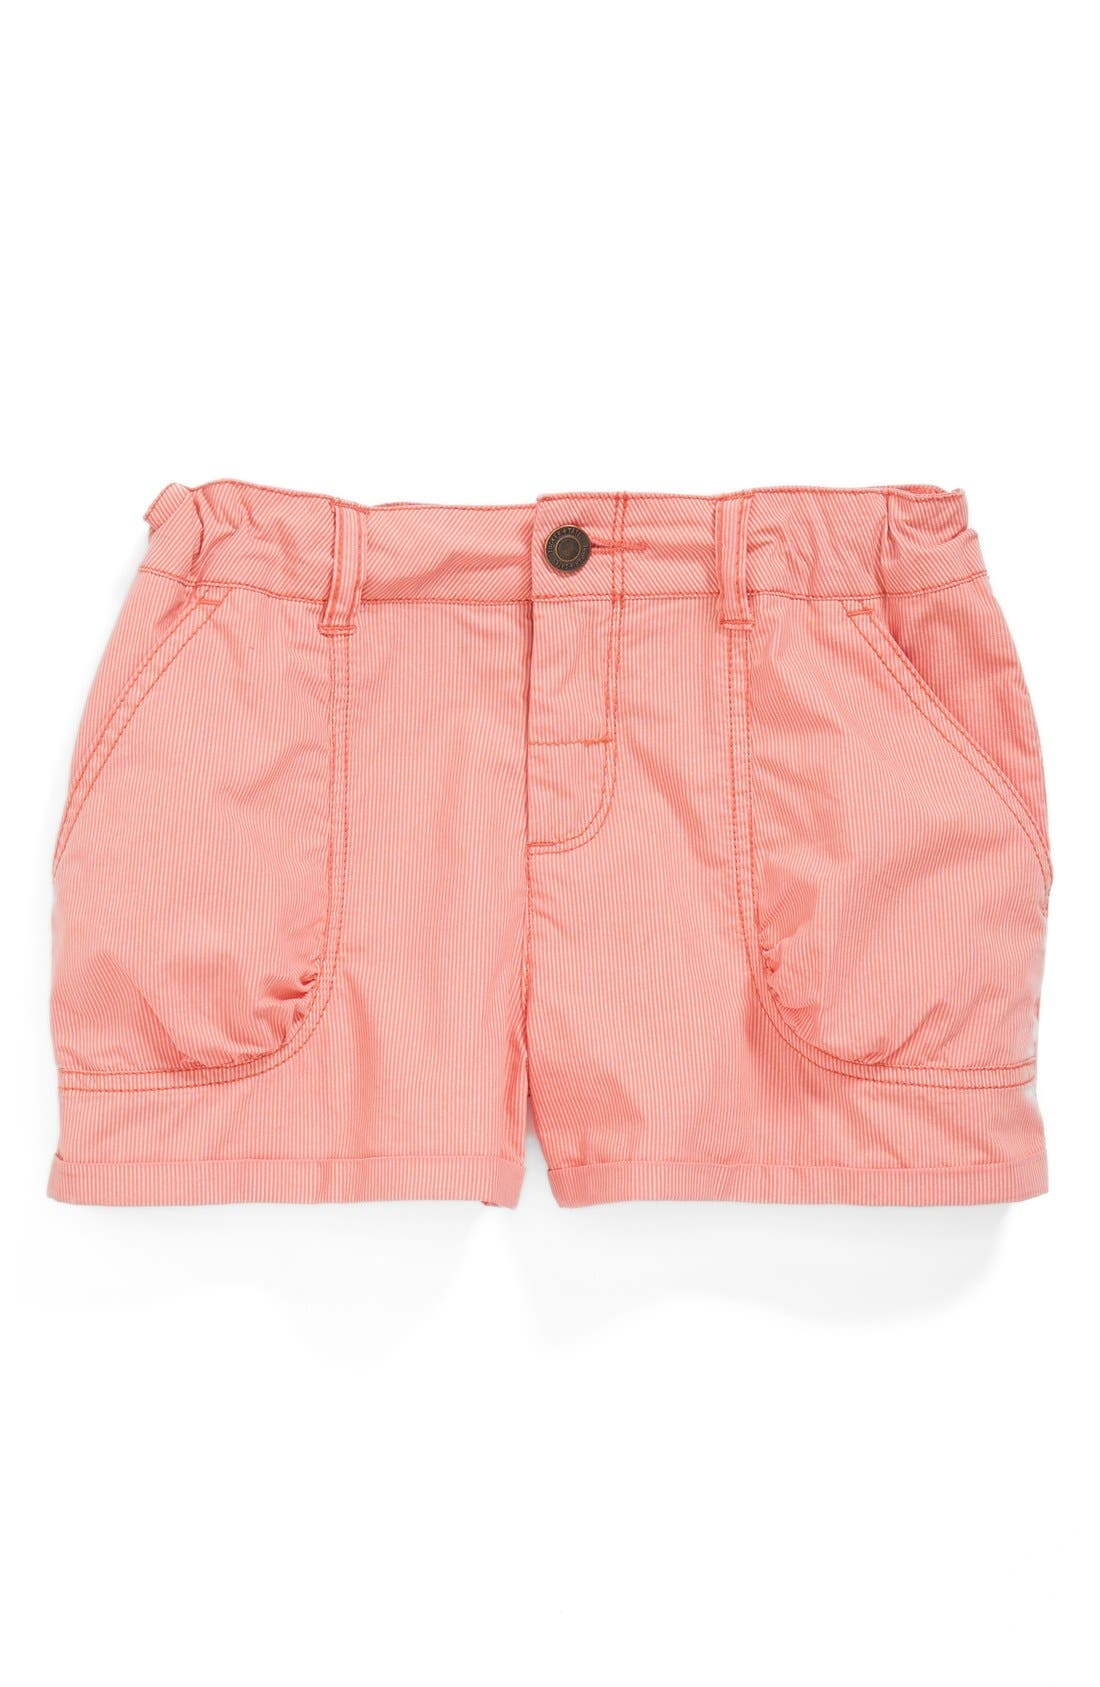 Alternate Image 1 Selected - Tucker + Tate 'Mindy' Shorts (Big Girls)